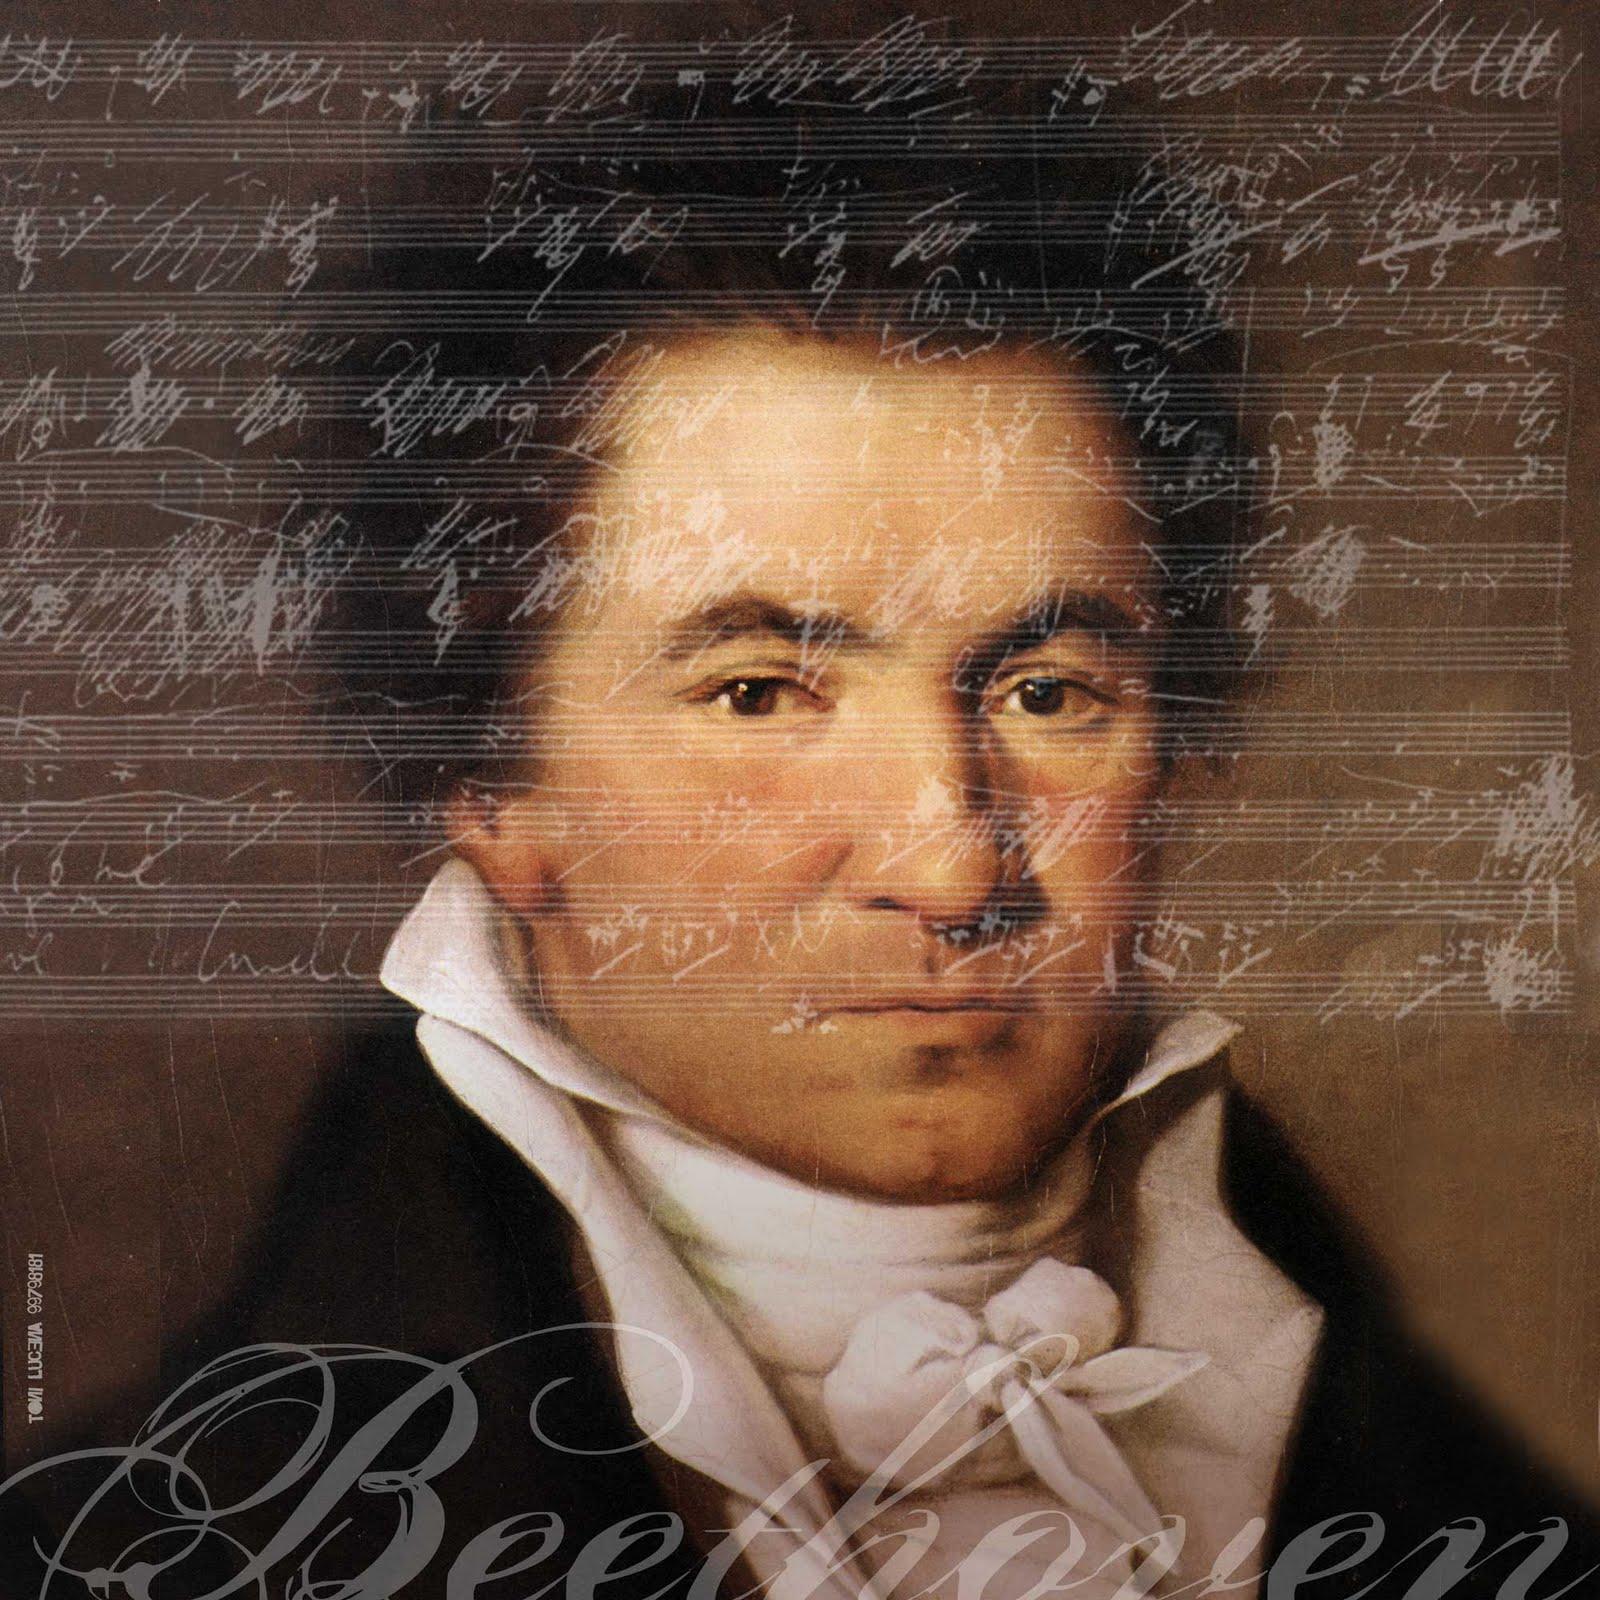 http://2.bp.blogspot.com/-OmulUxD73qc/T2mctsVuvuI/AAAAAAAACMc/s3QTslxF5p4/s1600/Beethoven-DEZ.jpg